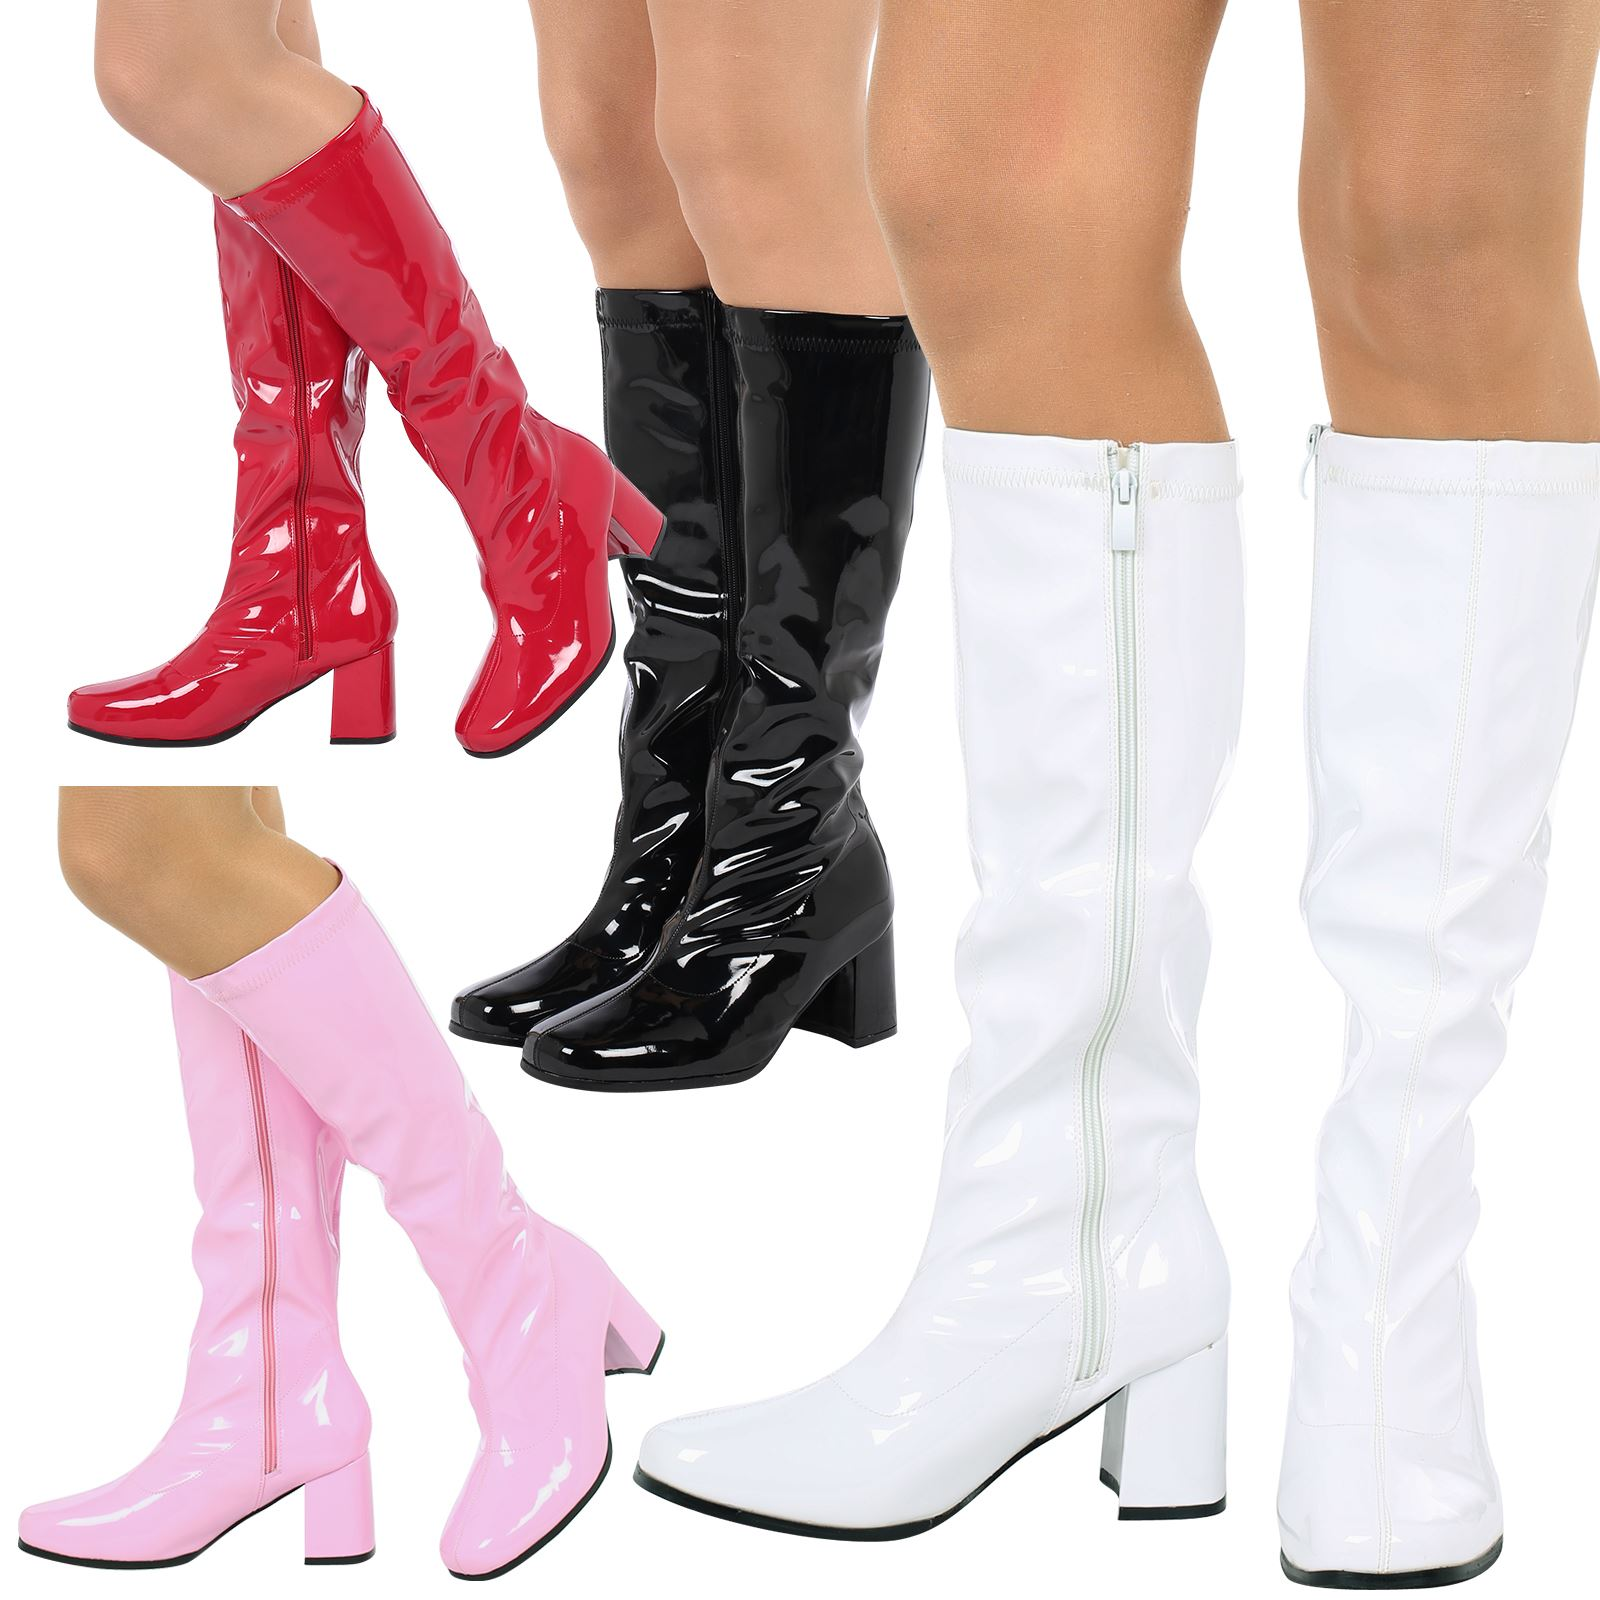 2985d43ec7b WOMENS BOOTS LADIES KNEE HIGH CALF FANCY DRESS GOGO 60s 70s PARTY RETRO  SIZE NEW